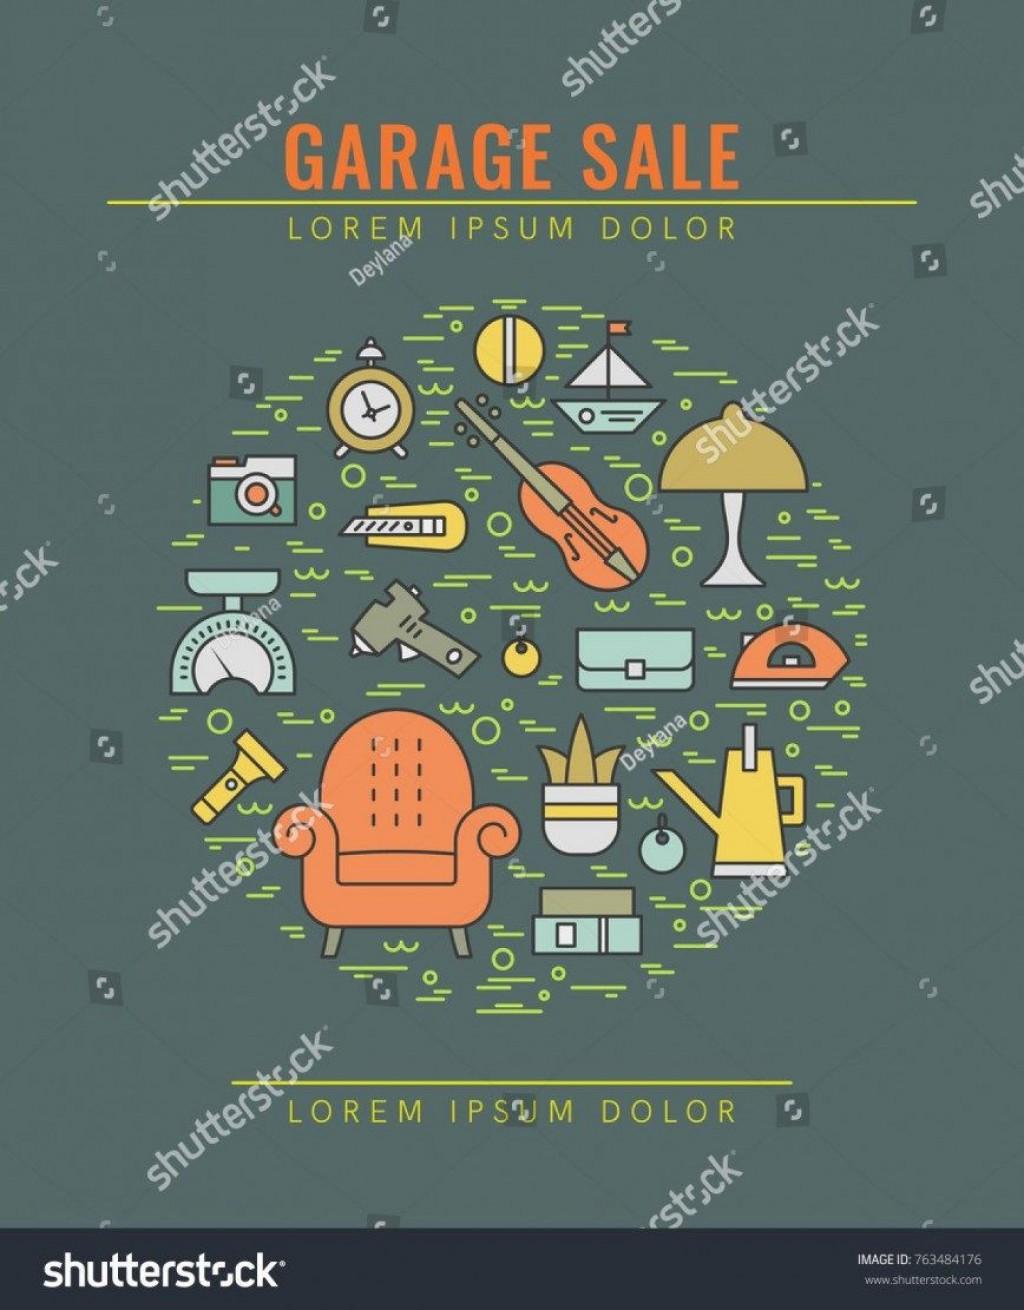 002 Unique Garage Sale Flyer Template Free Photo  Community Neighborhood YardLarge